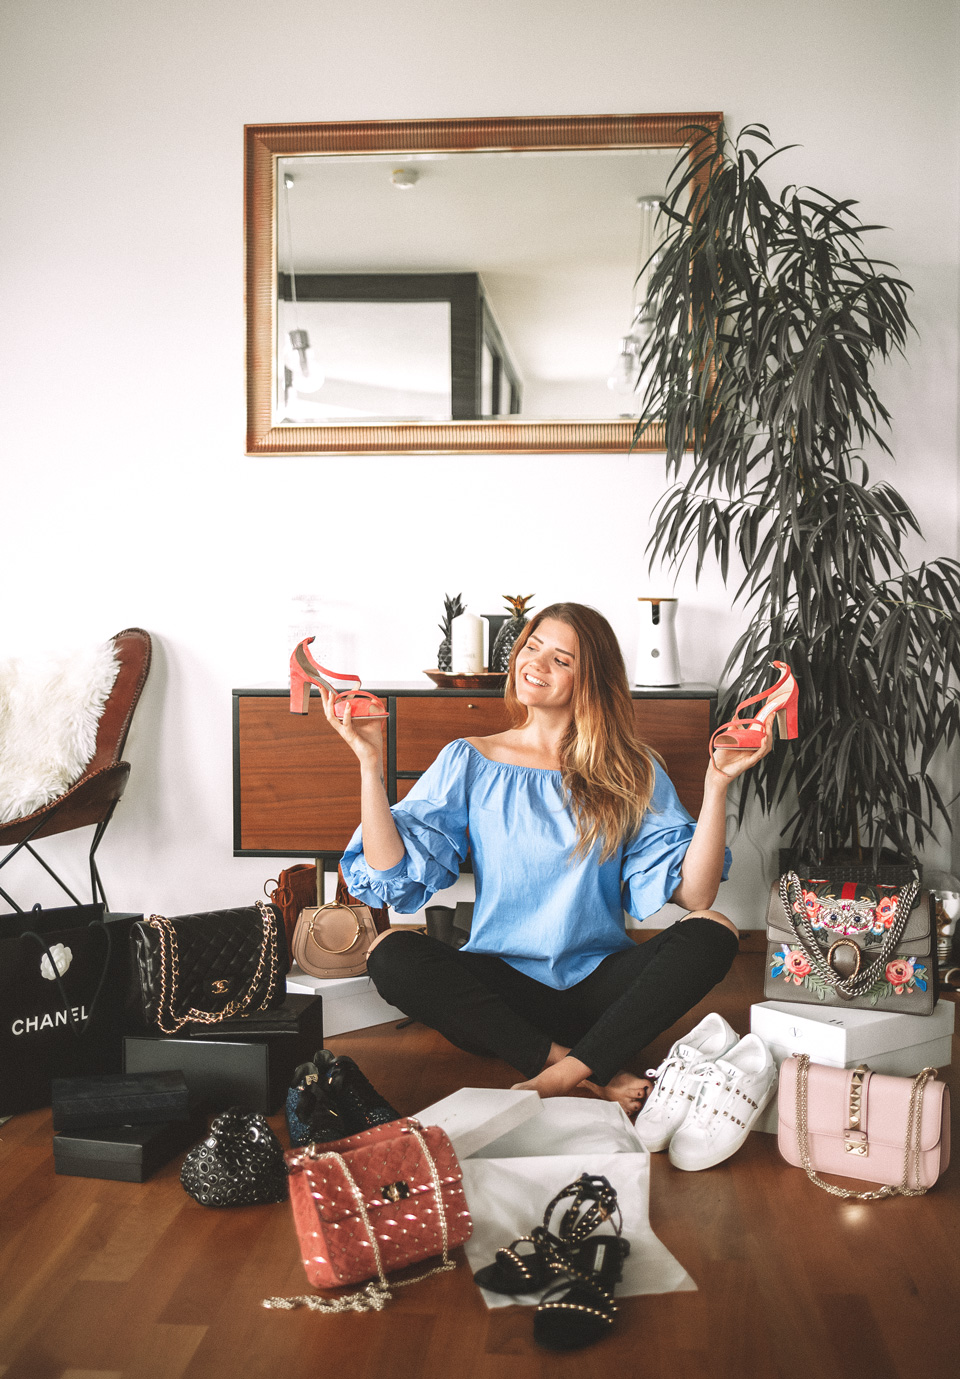 01a413b062ffa0 Luxury Fashion - Designerschätze günstig shoppen - Bea la Panthere I ...